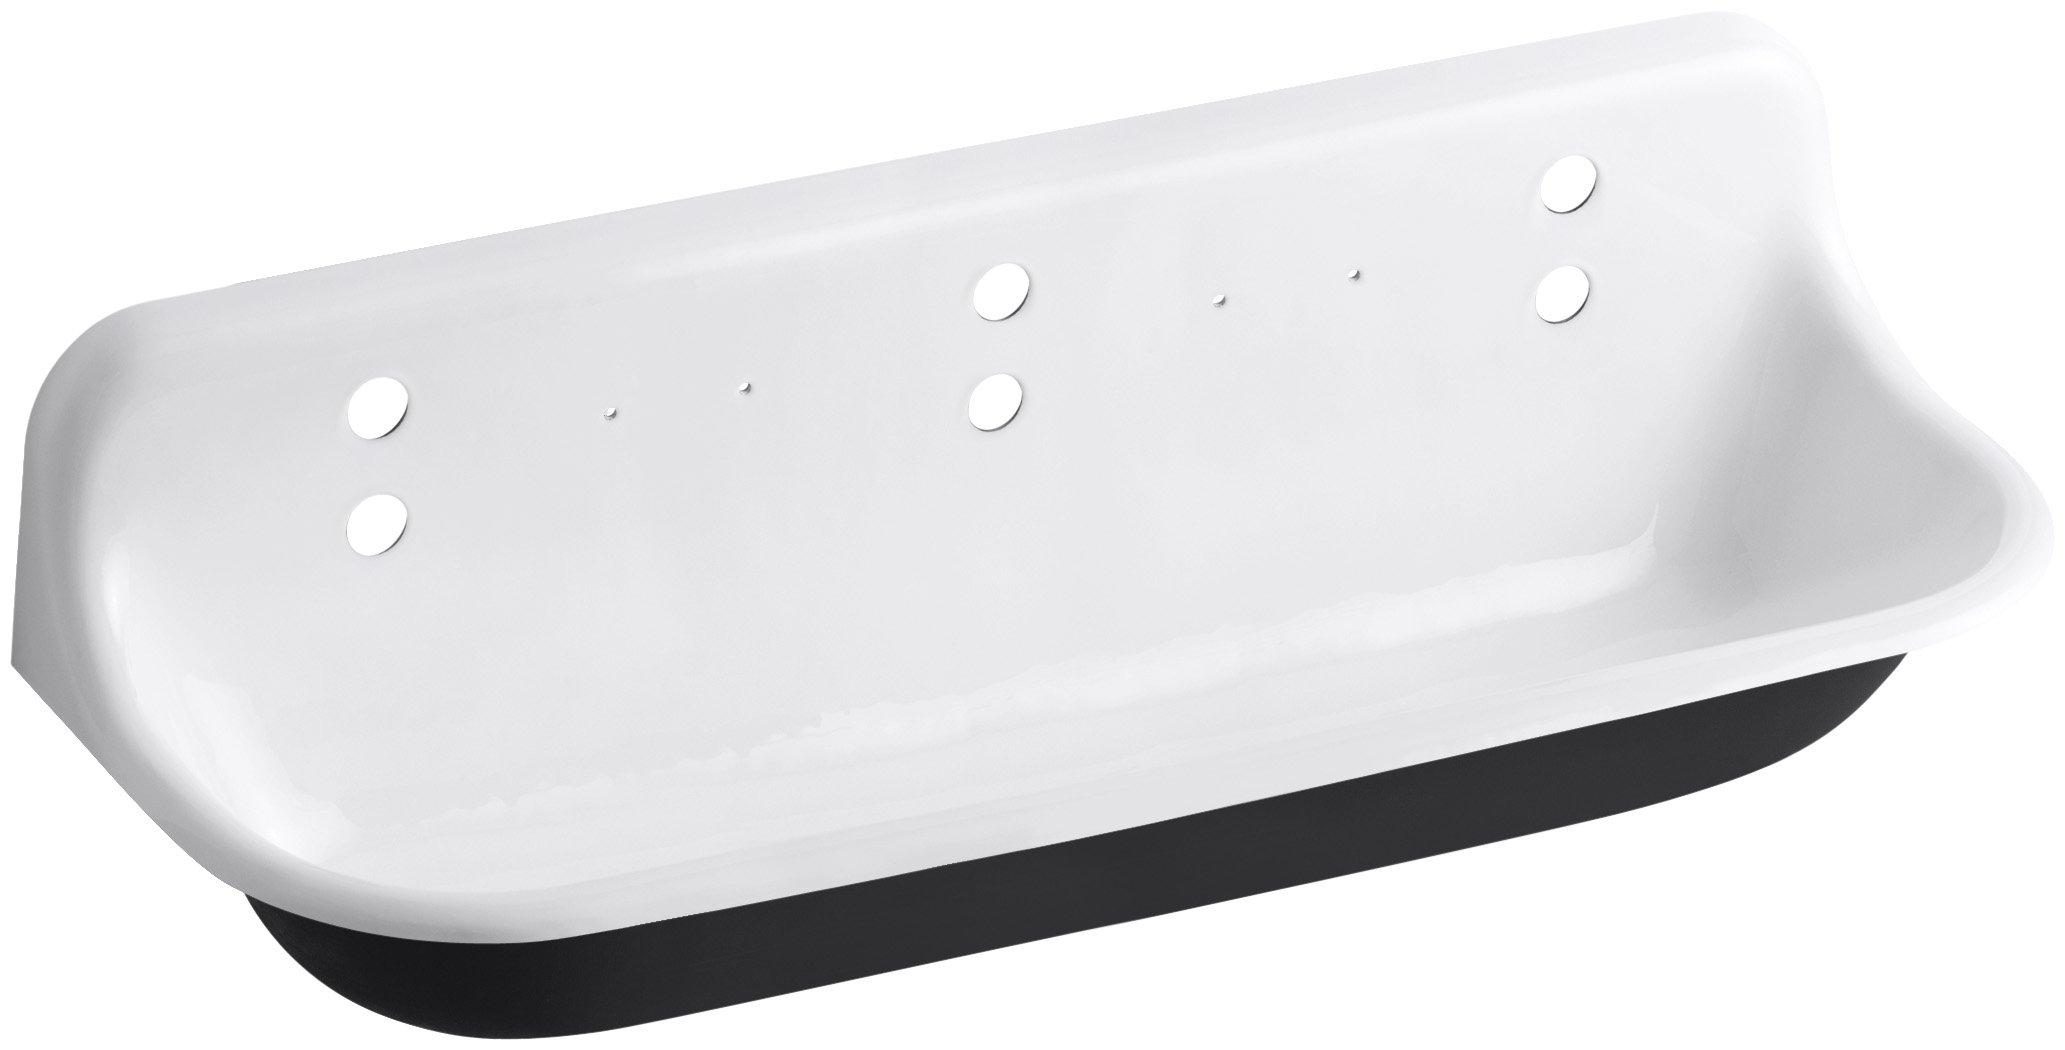 KOHLER K-3203-0 Brockway Wash Sink, White by Kohler